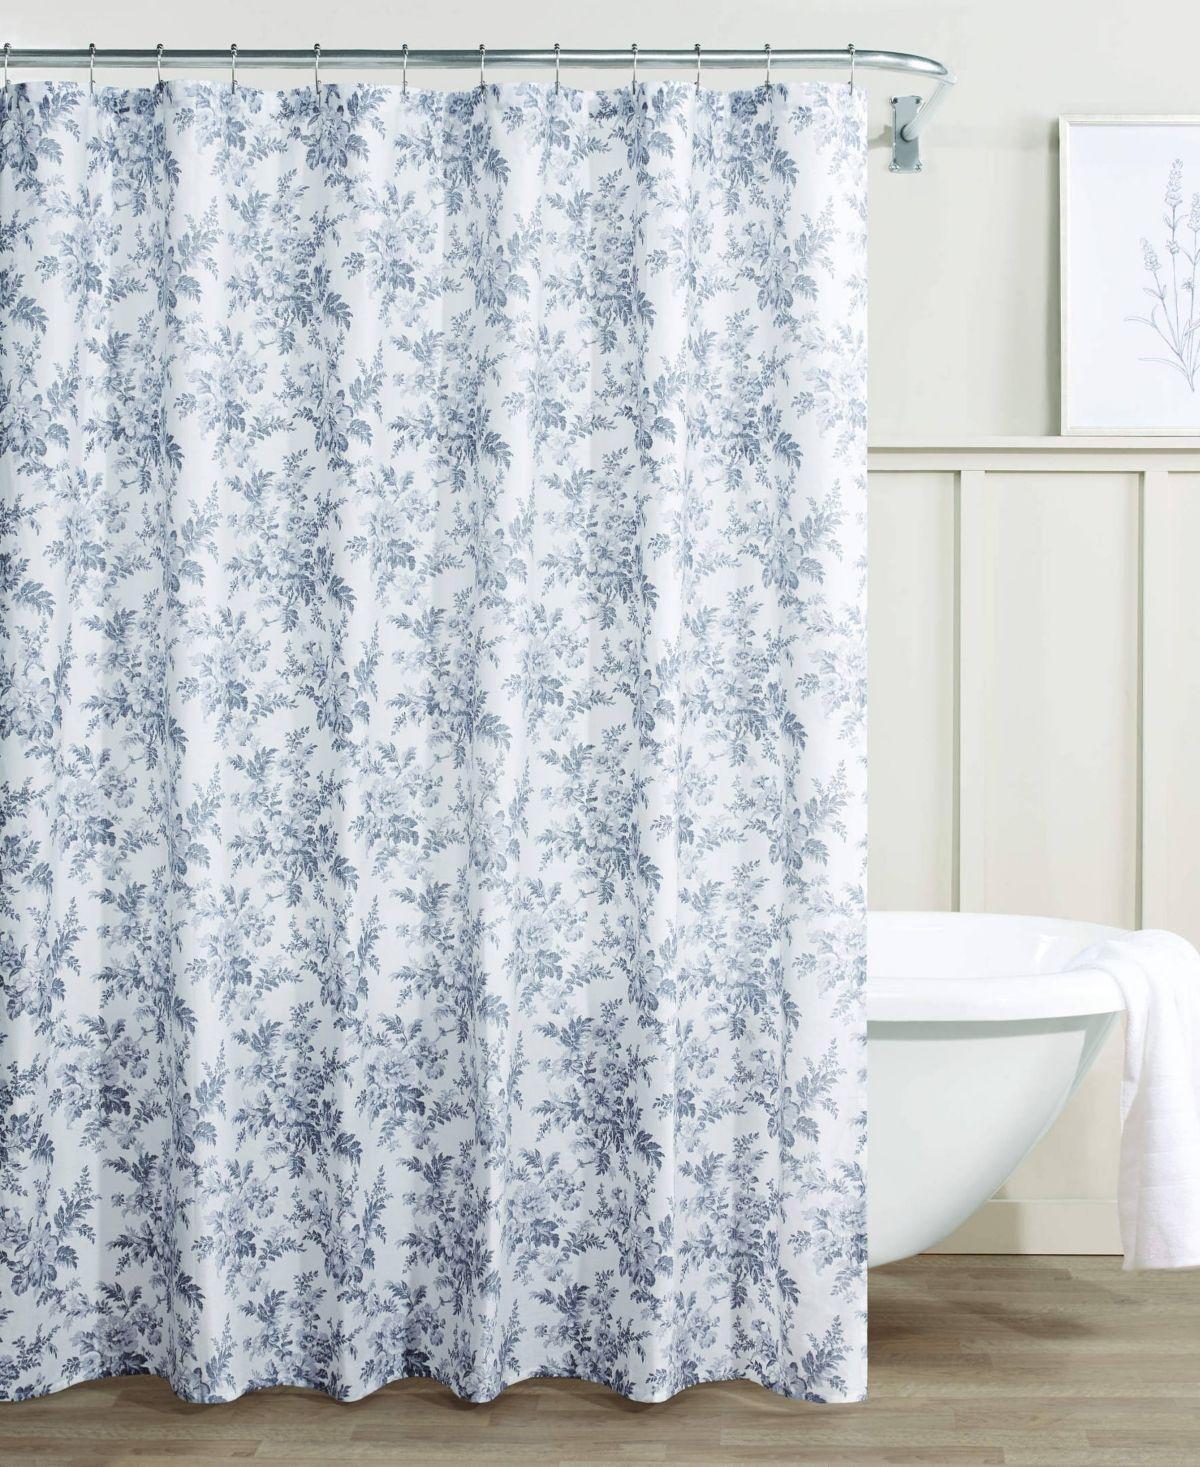 Laura Ashley Annalise Floral 100 Cotton Shower Curtain Reviews